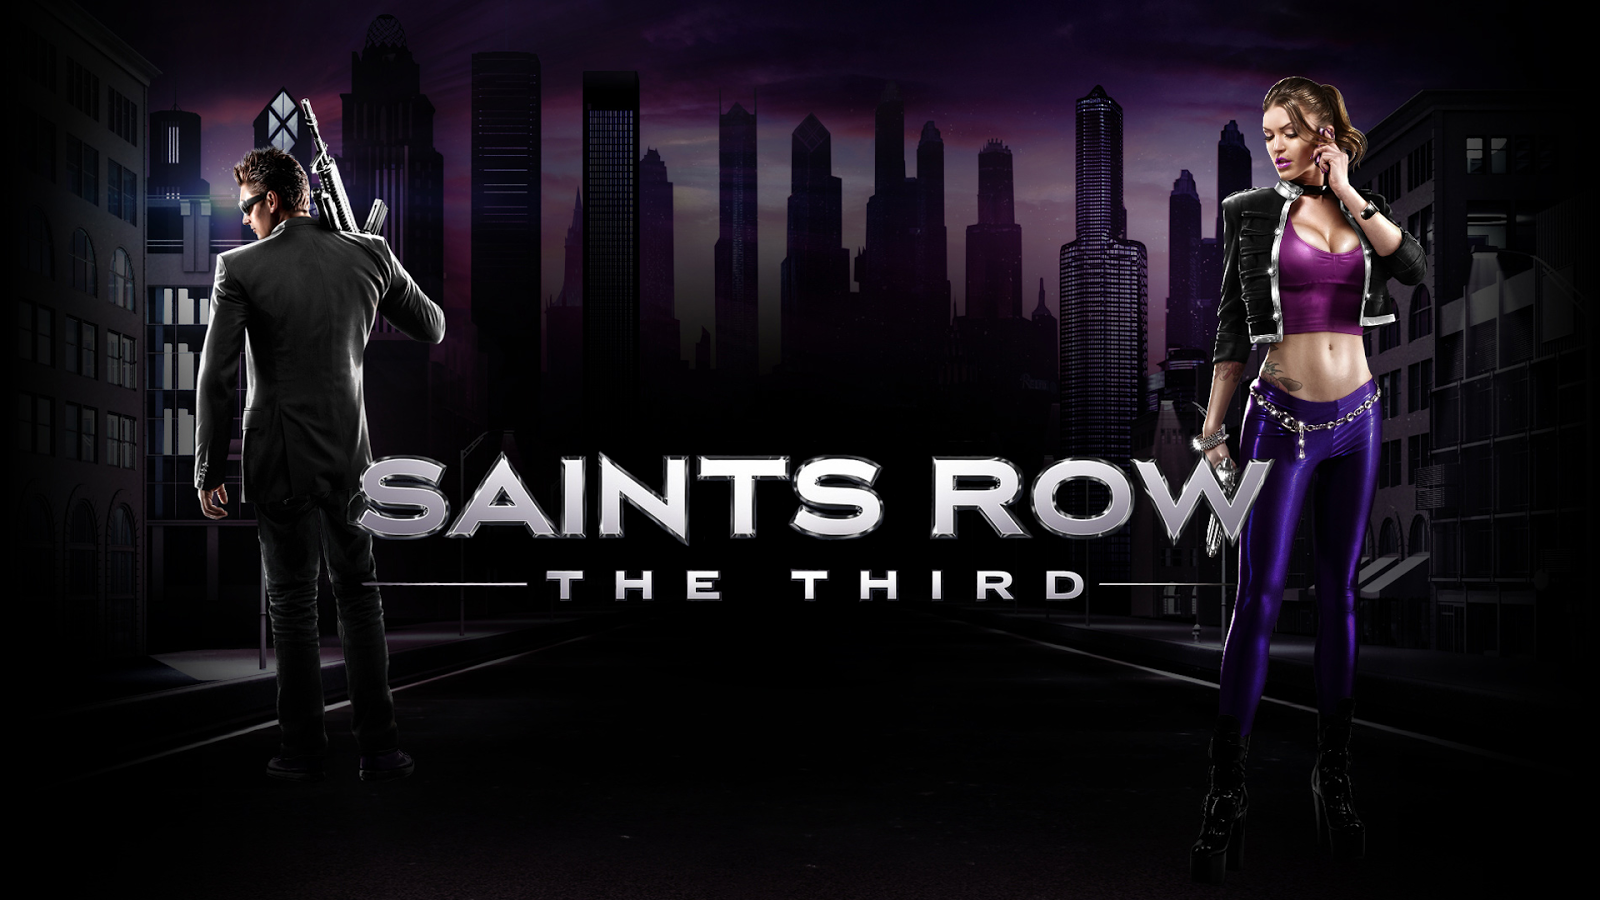 download third pc saints free row the